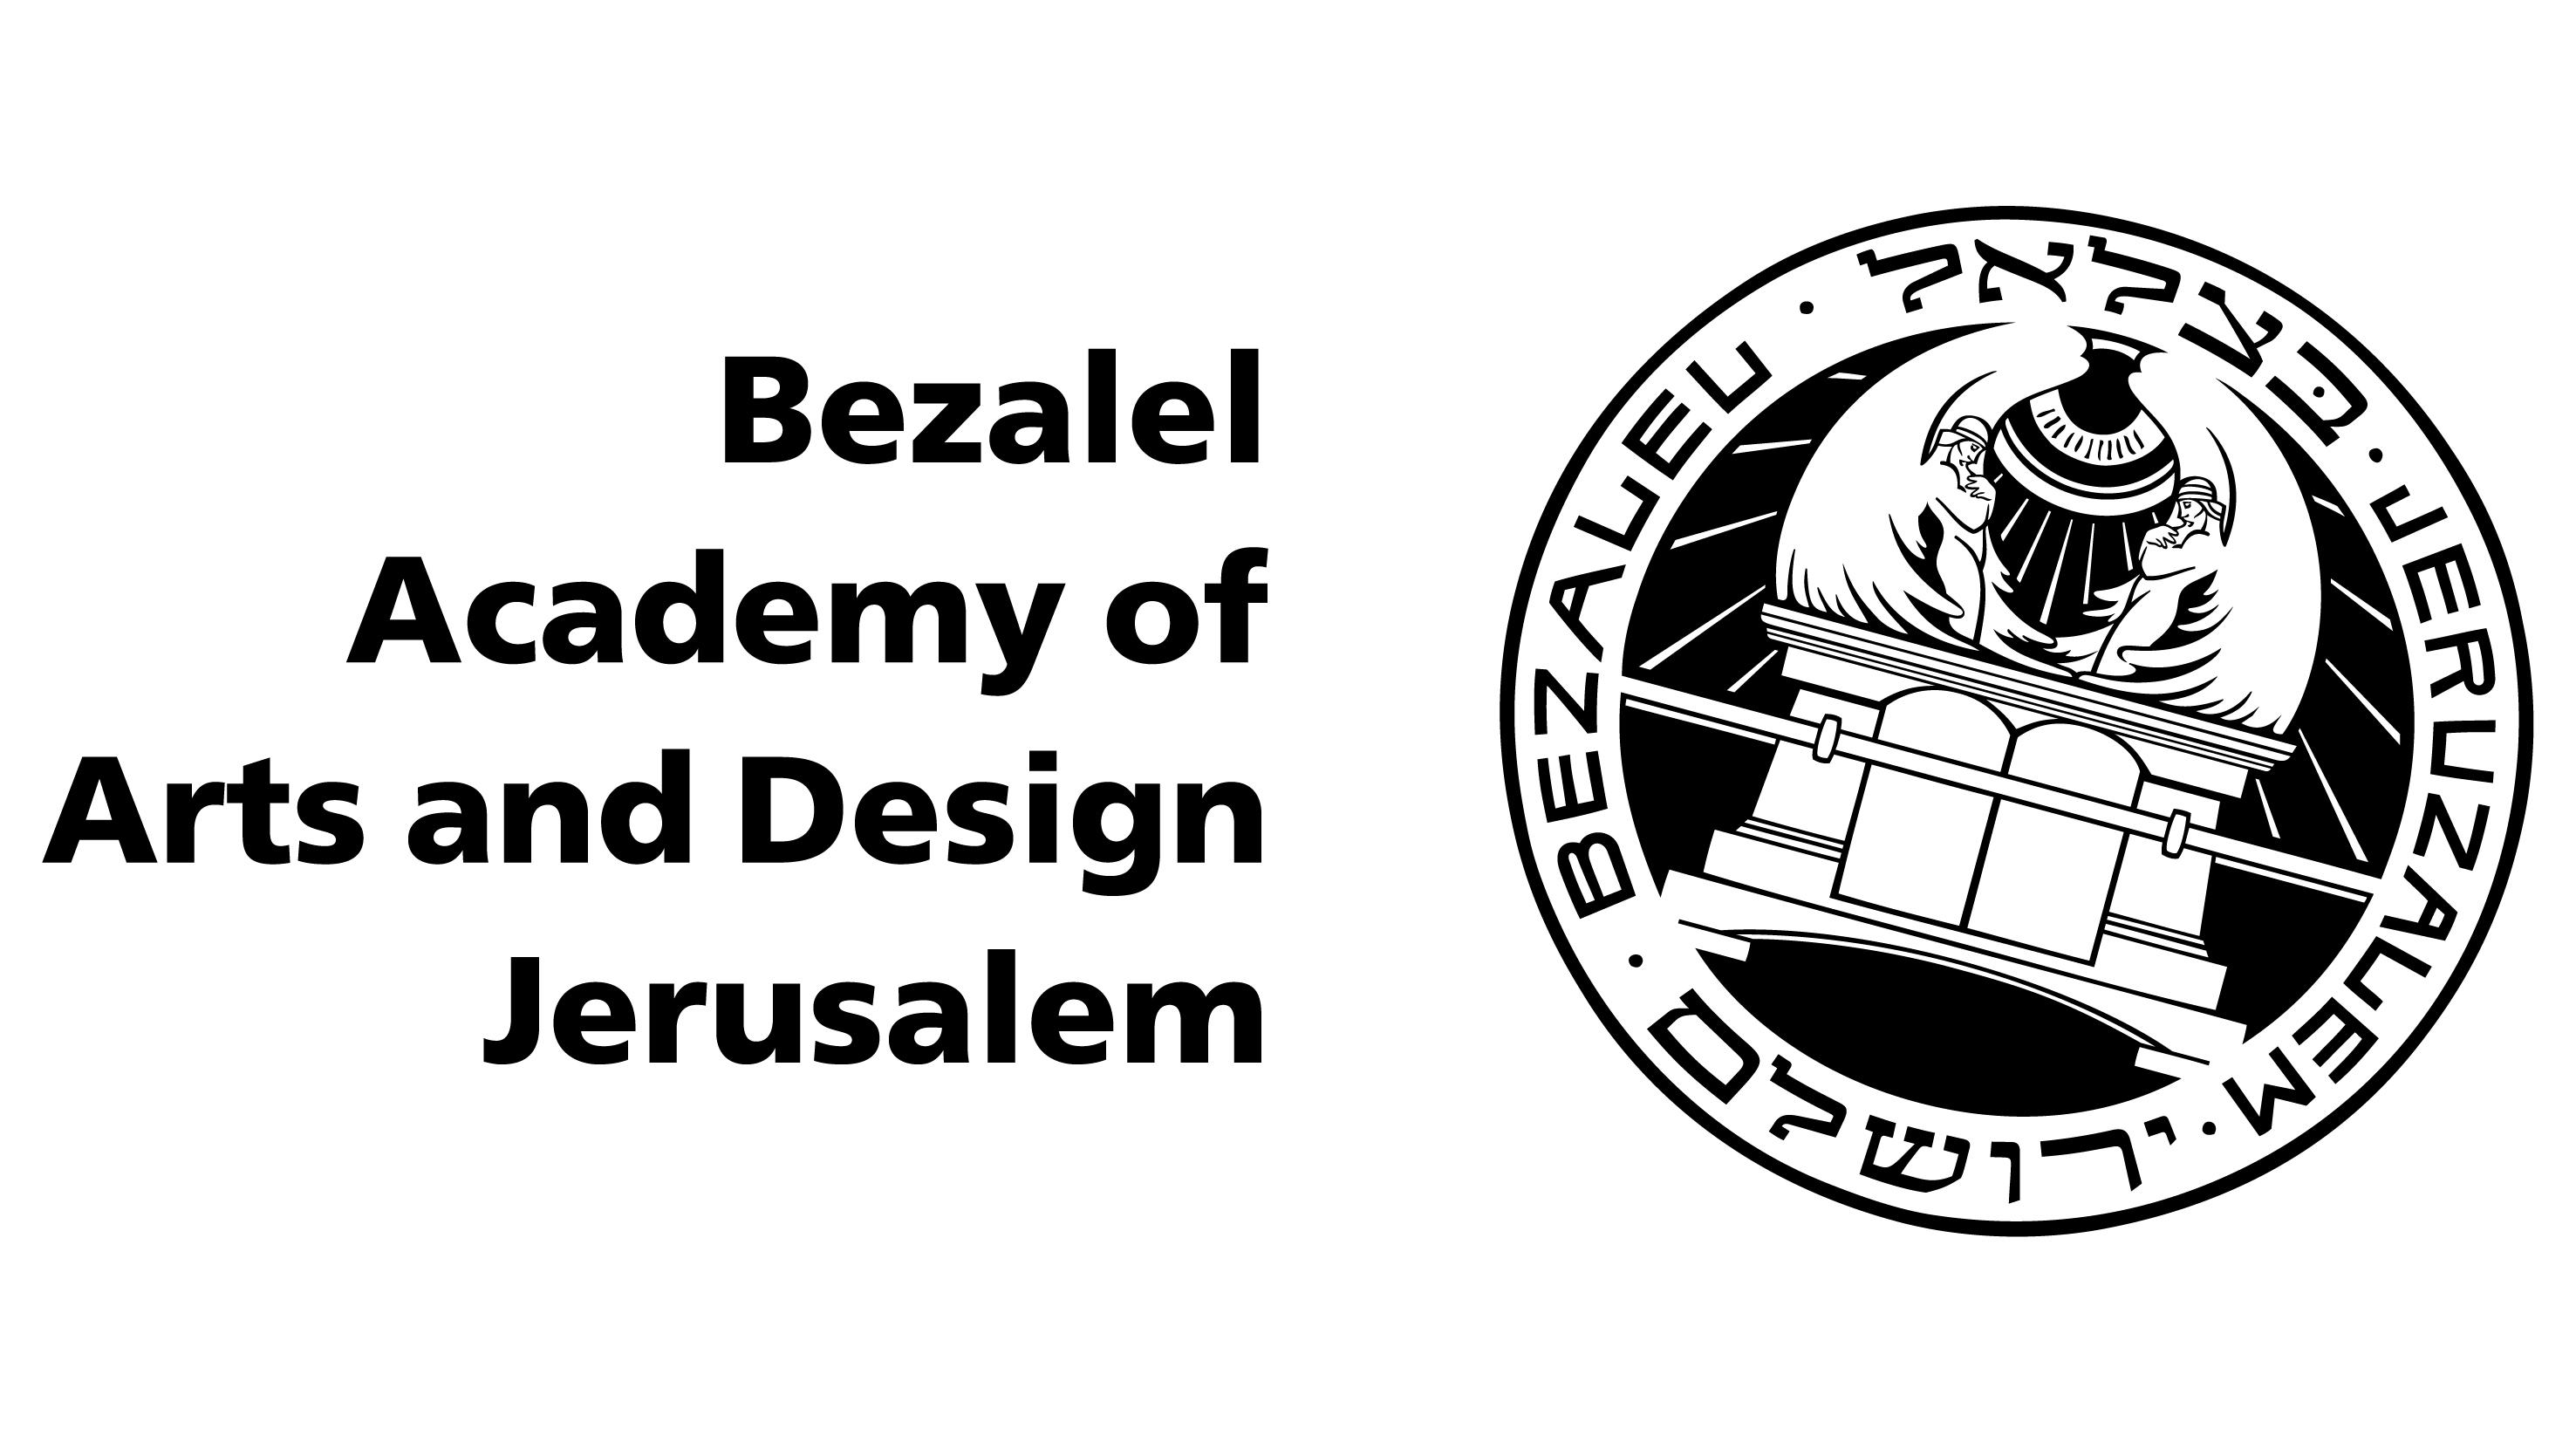 Bezalel Academy